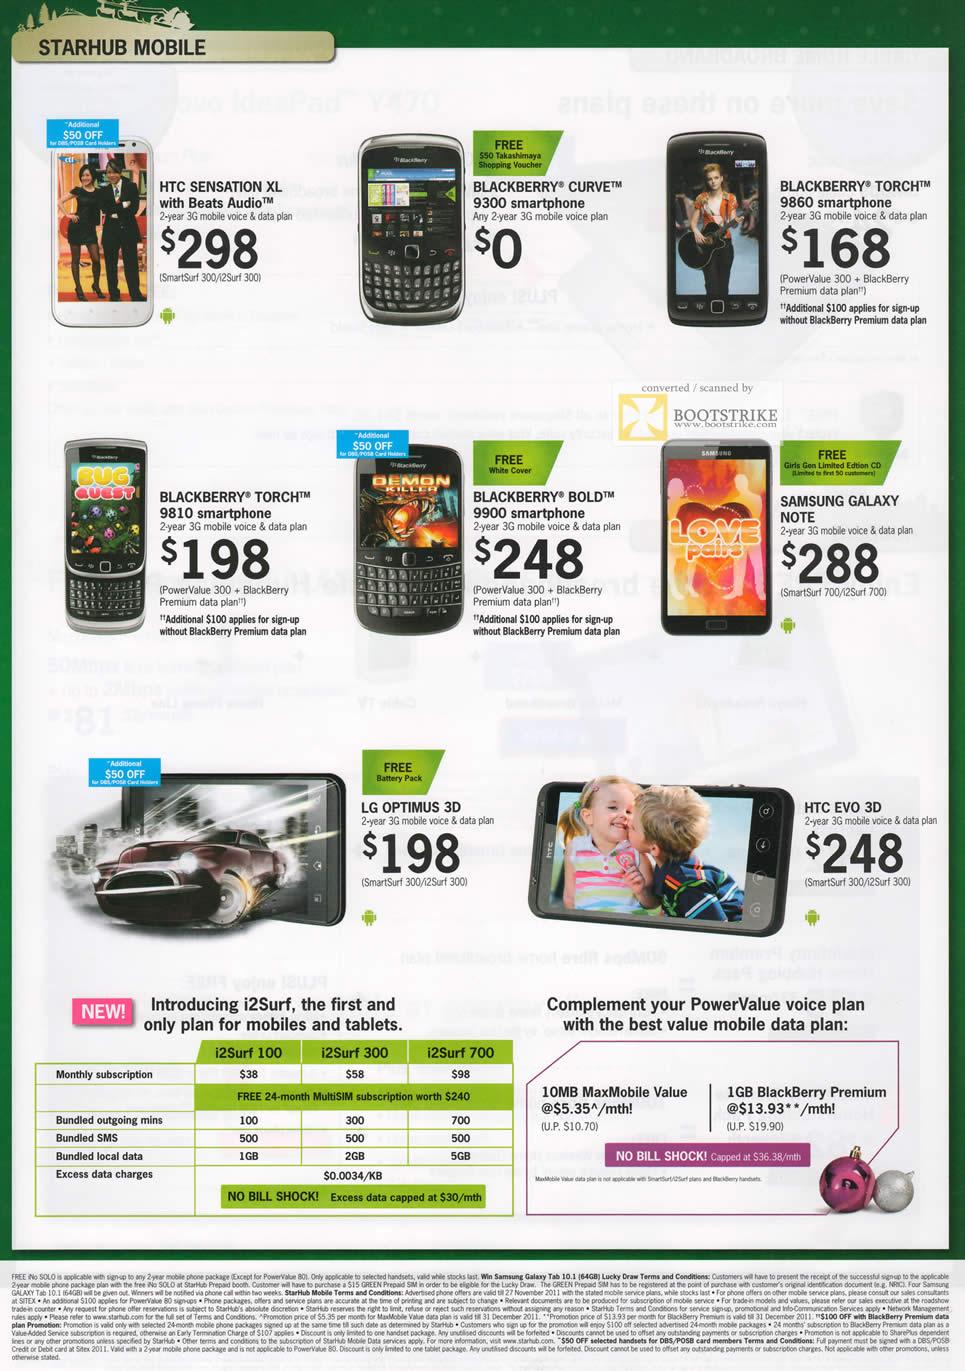 SITEX 2011 price list image brochure of Starhub Mobile HTC Sensation XL, Blackberry Curve 9300, Torch 9860, Torch 9810, Bold 9900, Samsung Galaxy Note, LG Optimus 3D, HTC Evo 3D, I2Surf Plan